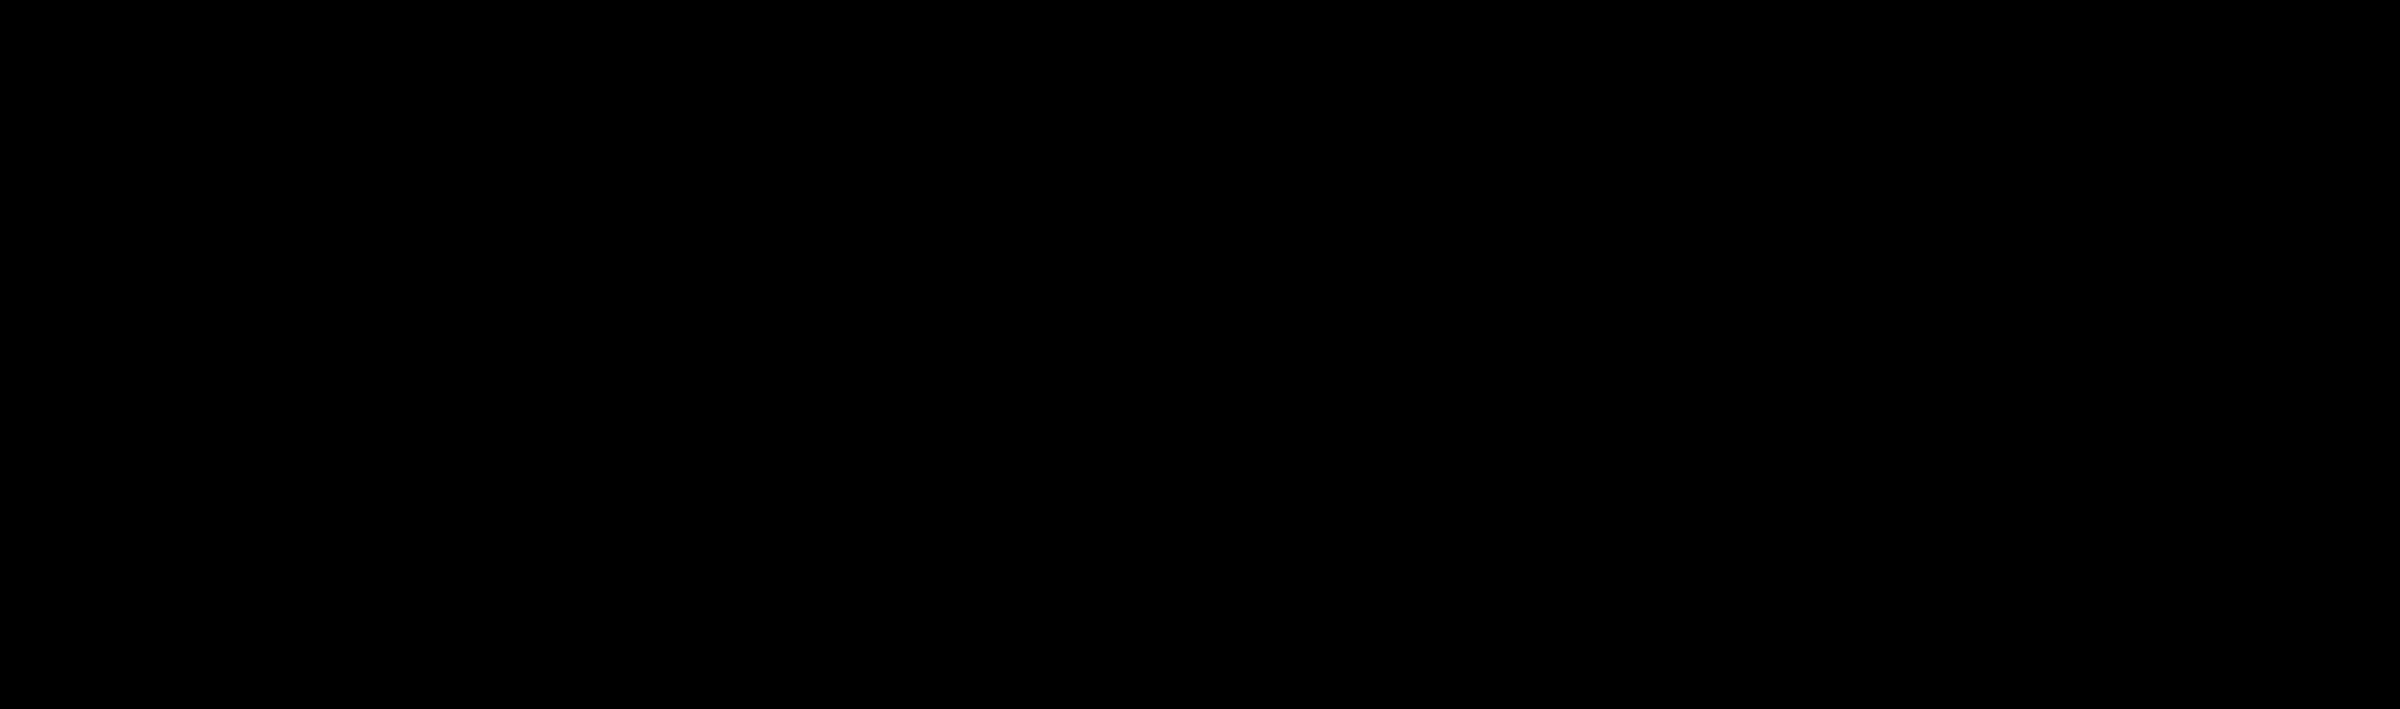 Clairol Logo PNG Transparent & SVG Vector.